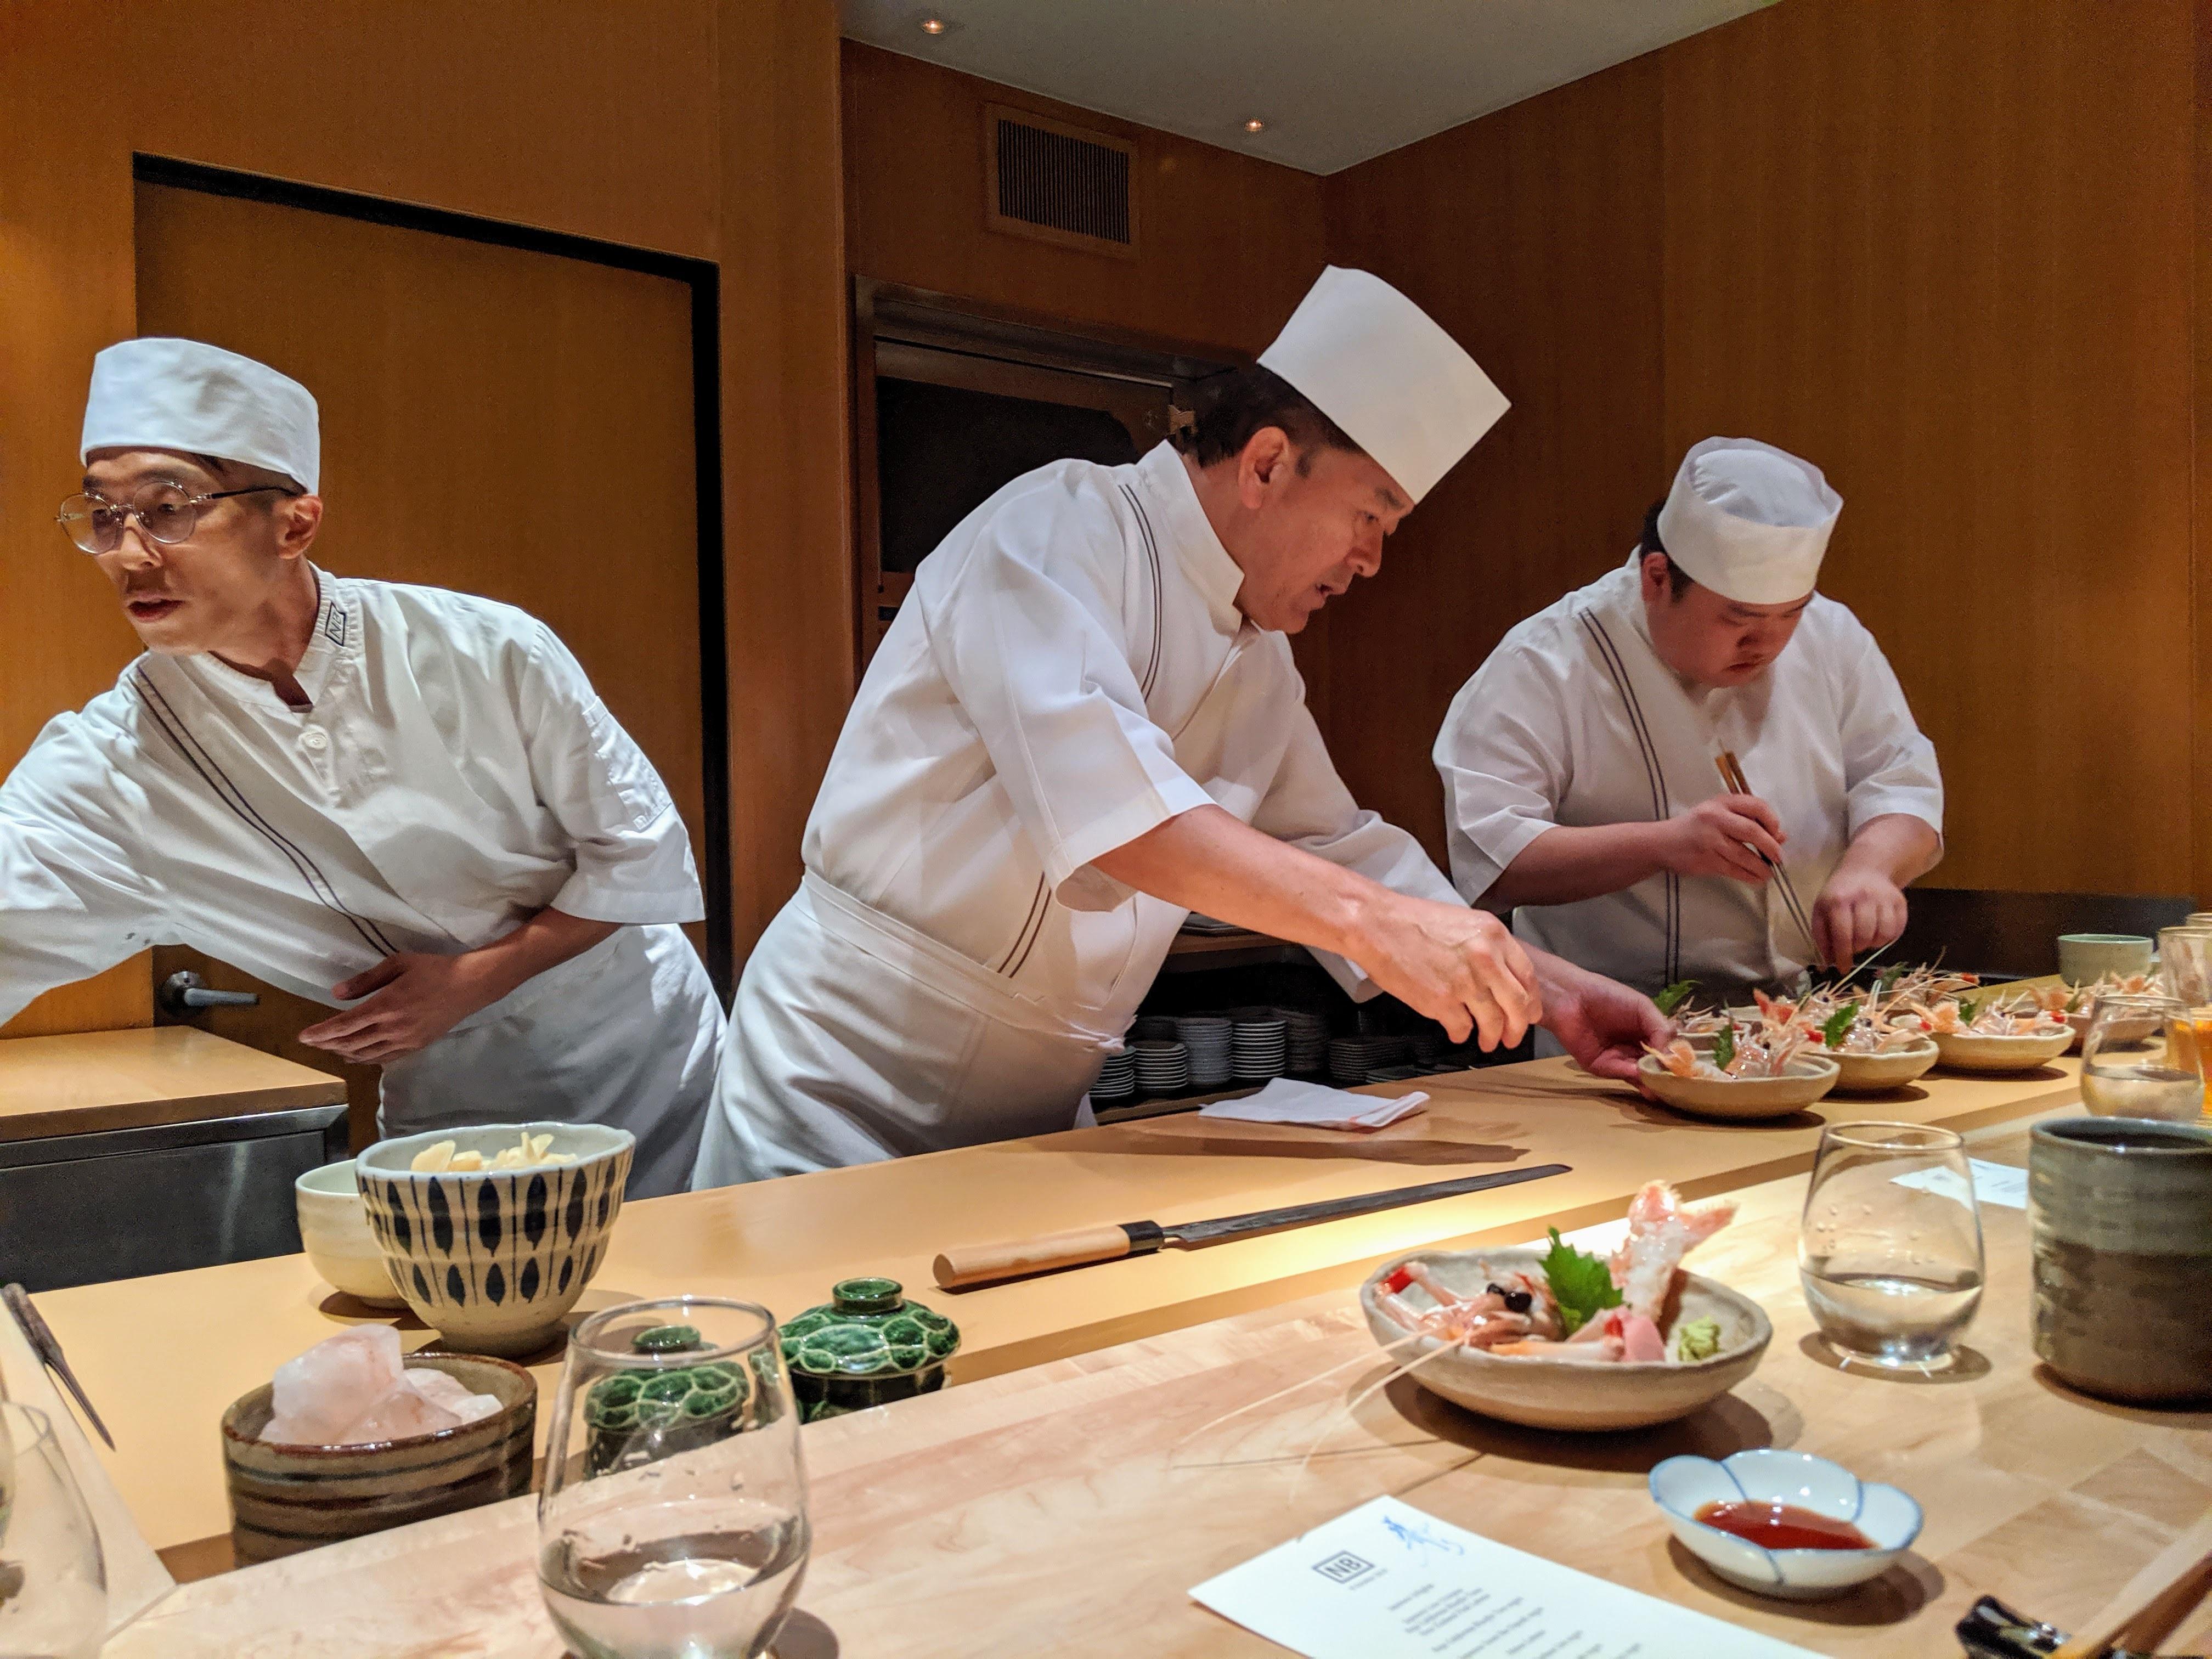 Chef Osamu Fujita of Nozawa Bar working with other chefs at the counter.